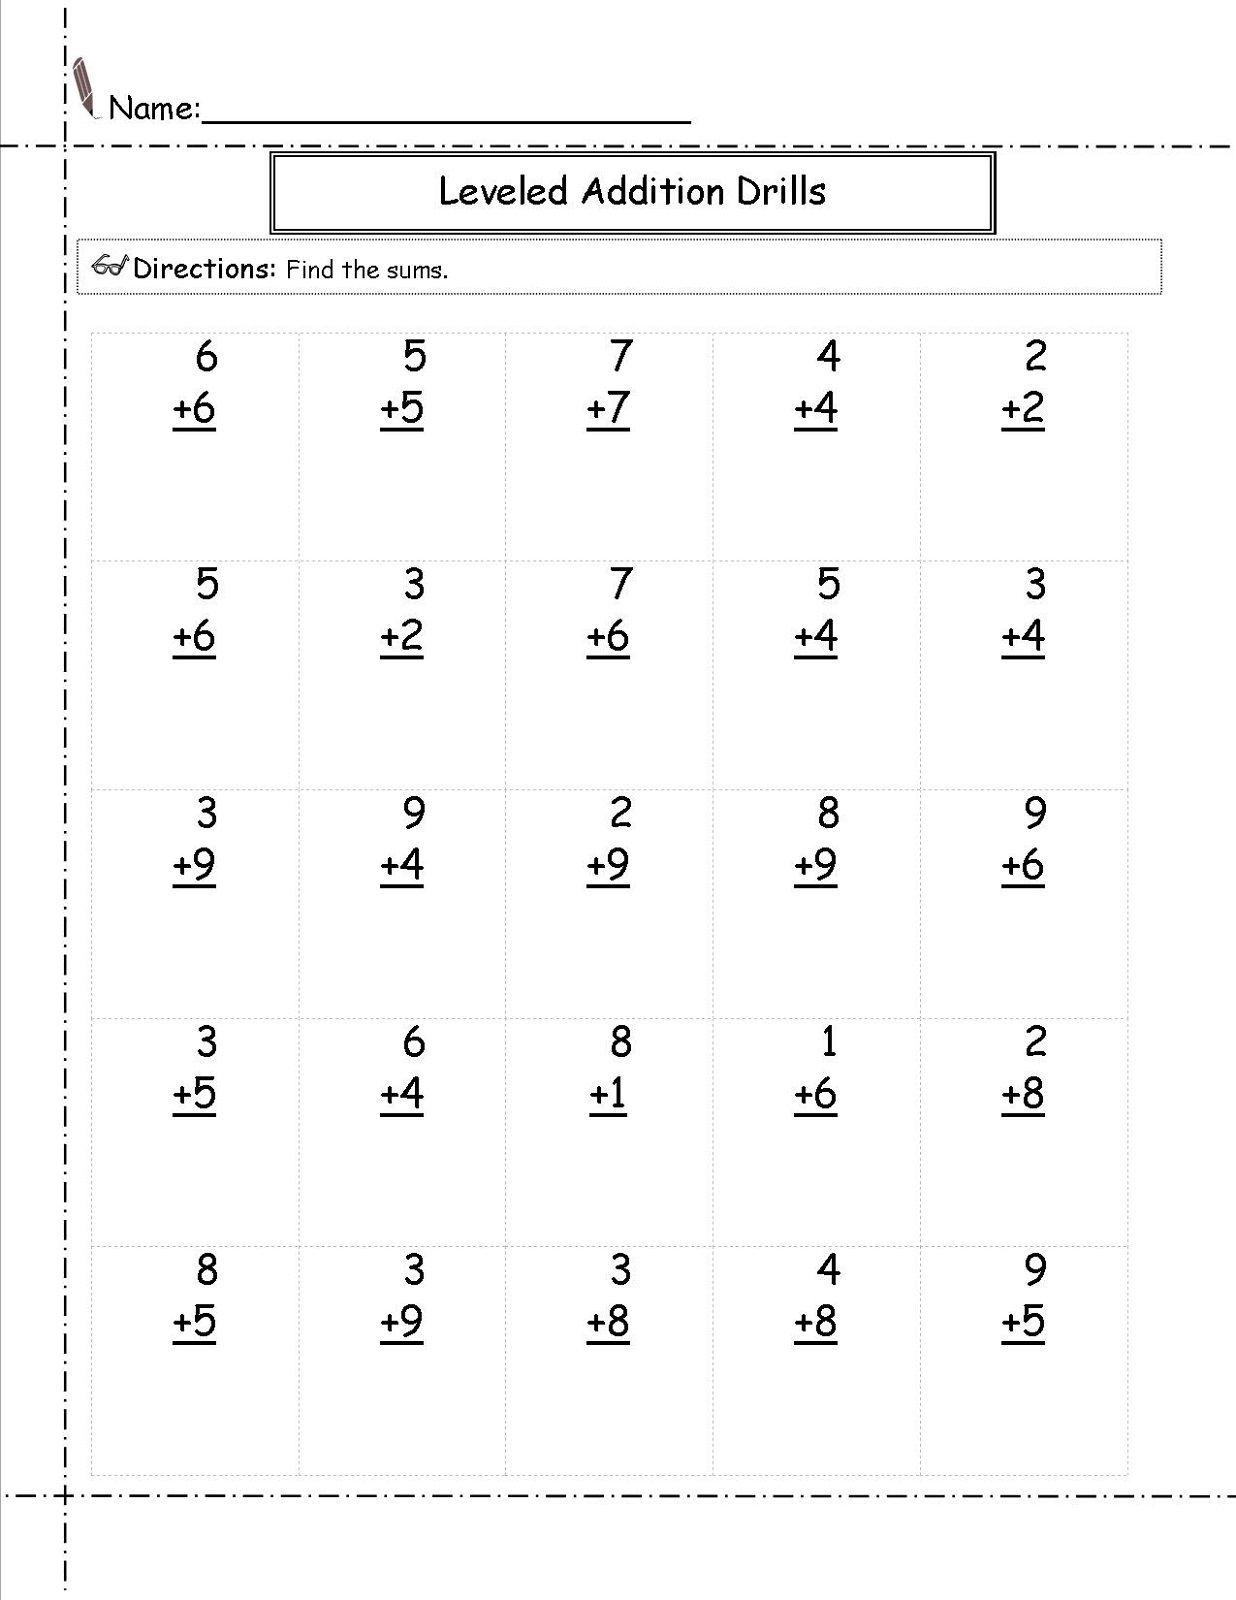 free basic math worksheets nd grade  printableshelter  math  free basic math worksheets nd grade  printableshelter